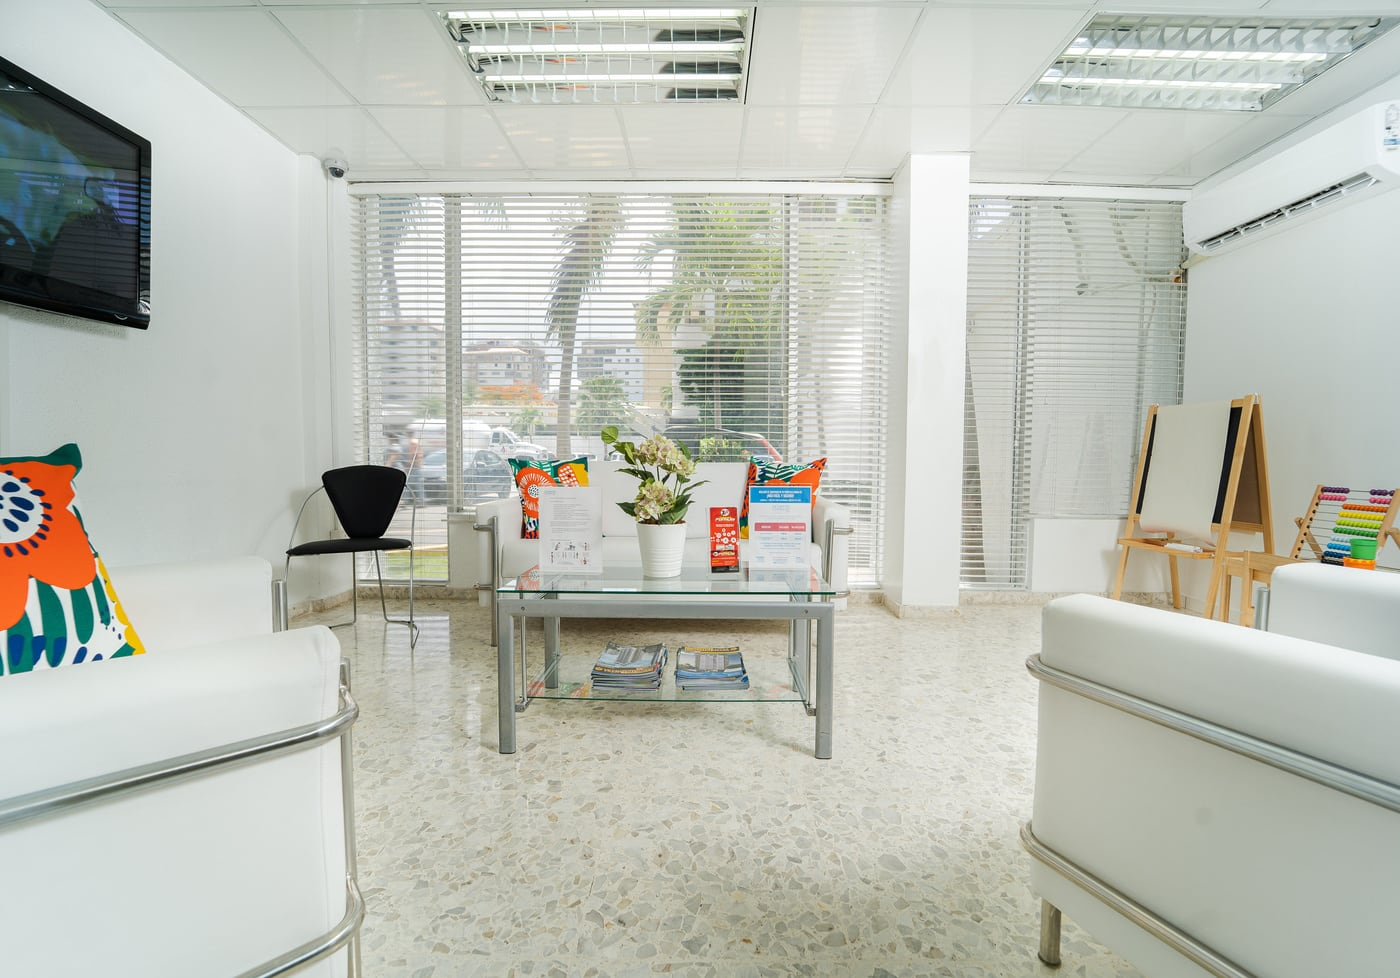 Foto de nuestras instalaciones | 7p0A2OfBc8UD3ISU0J6lxg343